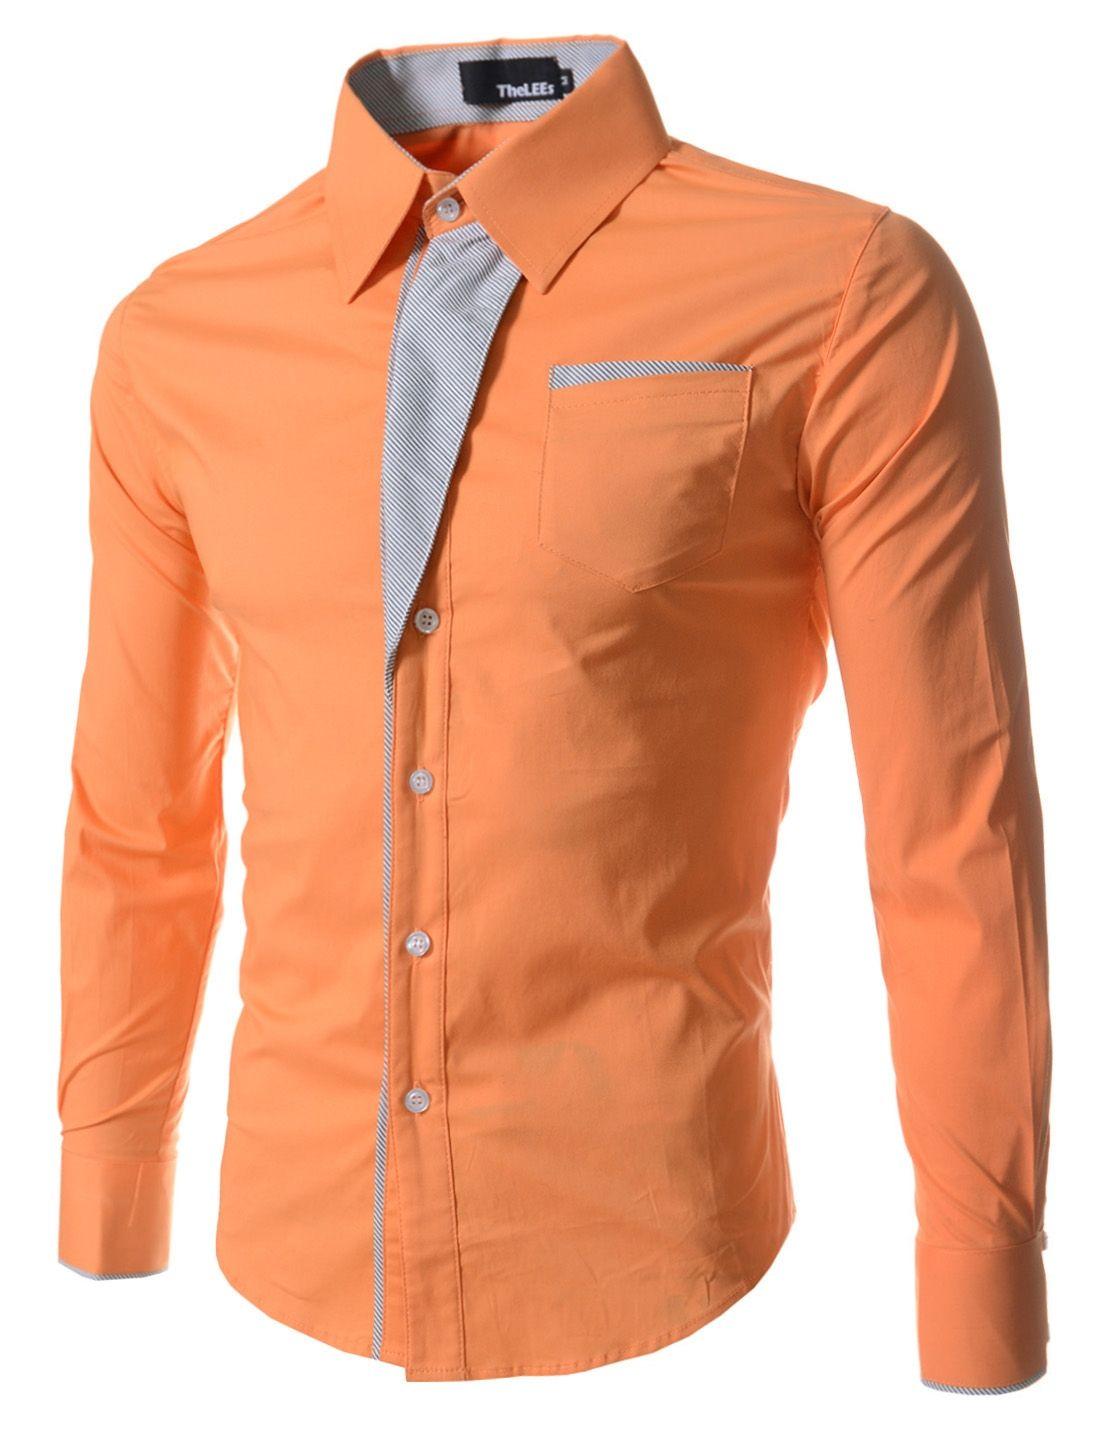 Brand new Korean business fashion clothing for men. Slim fit